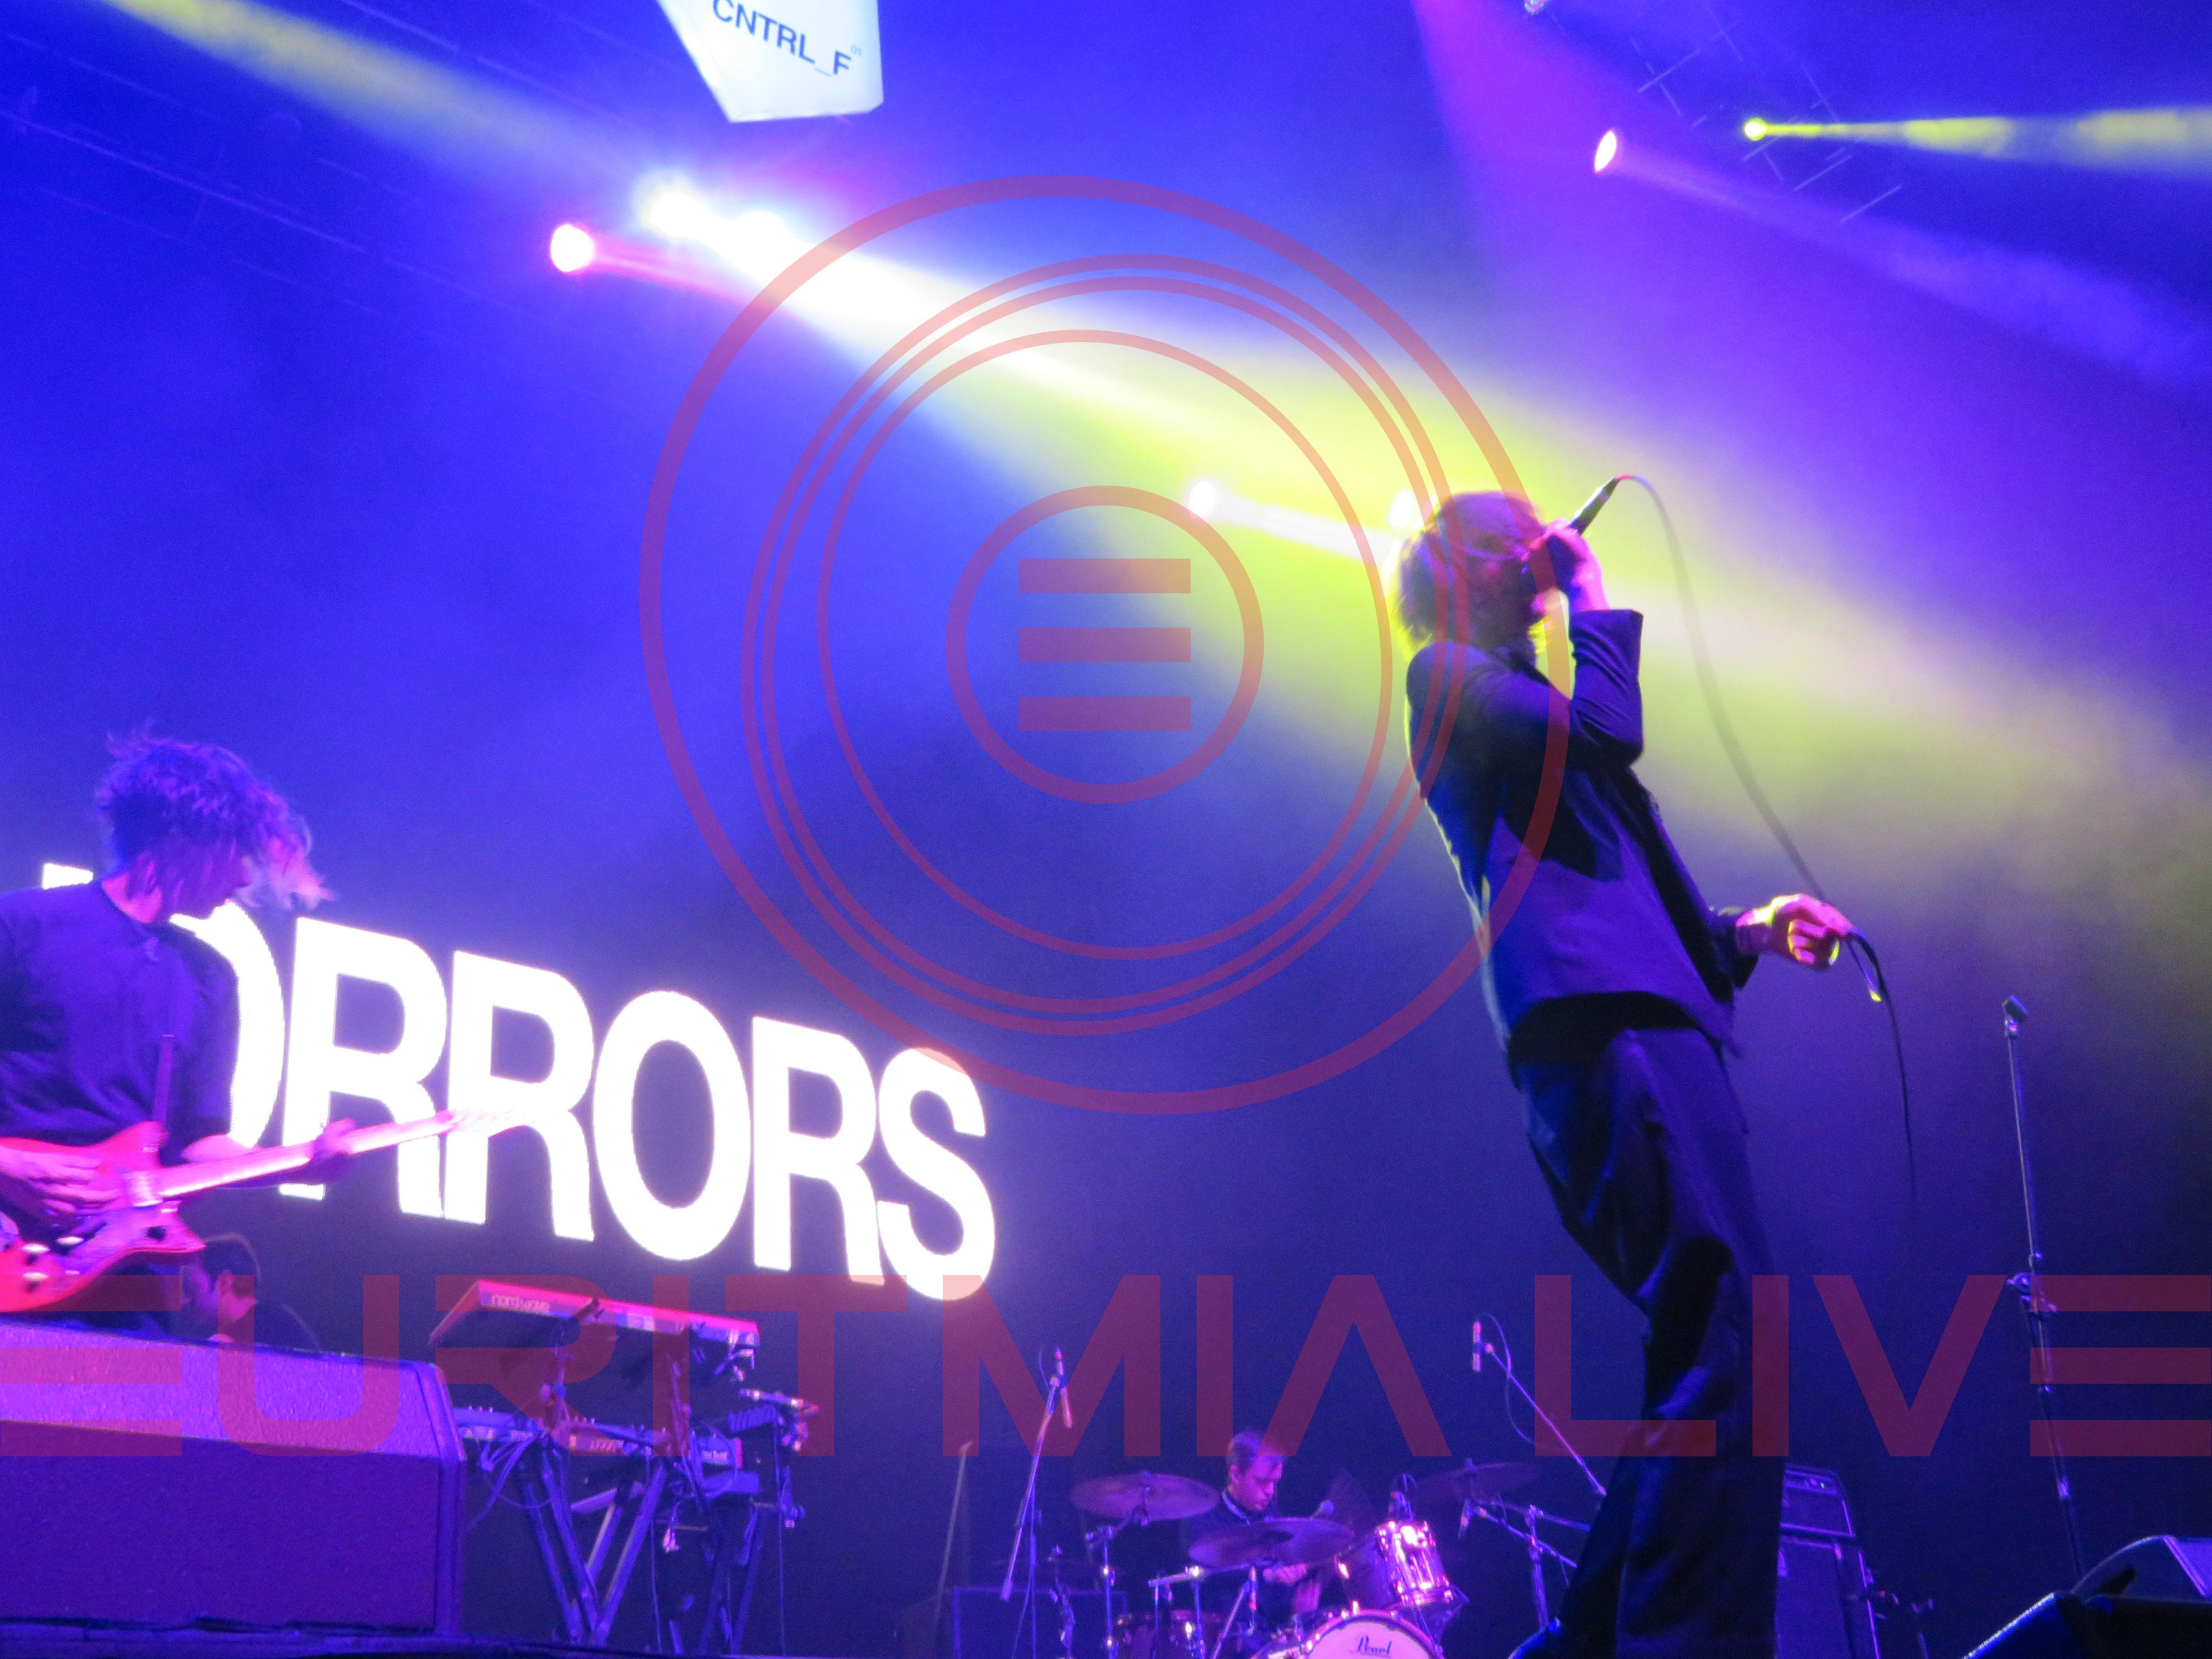 horrors5